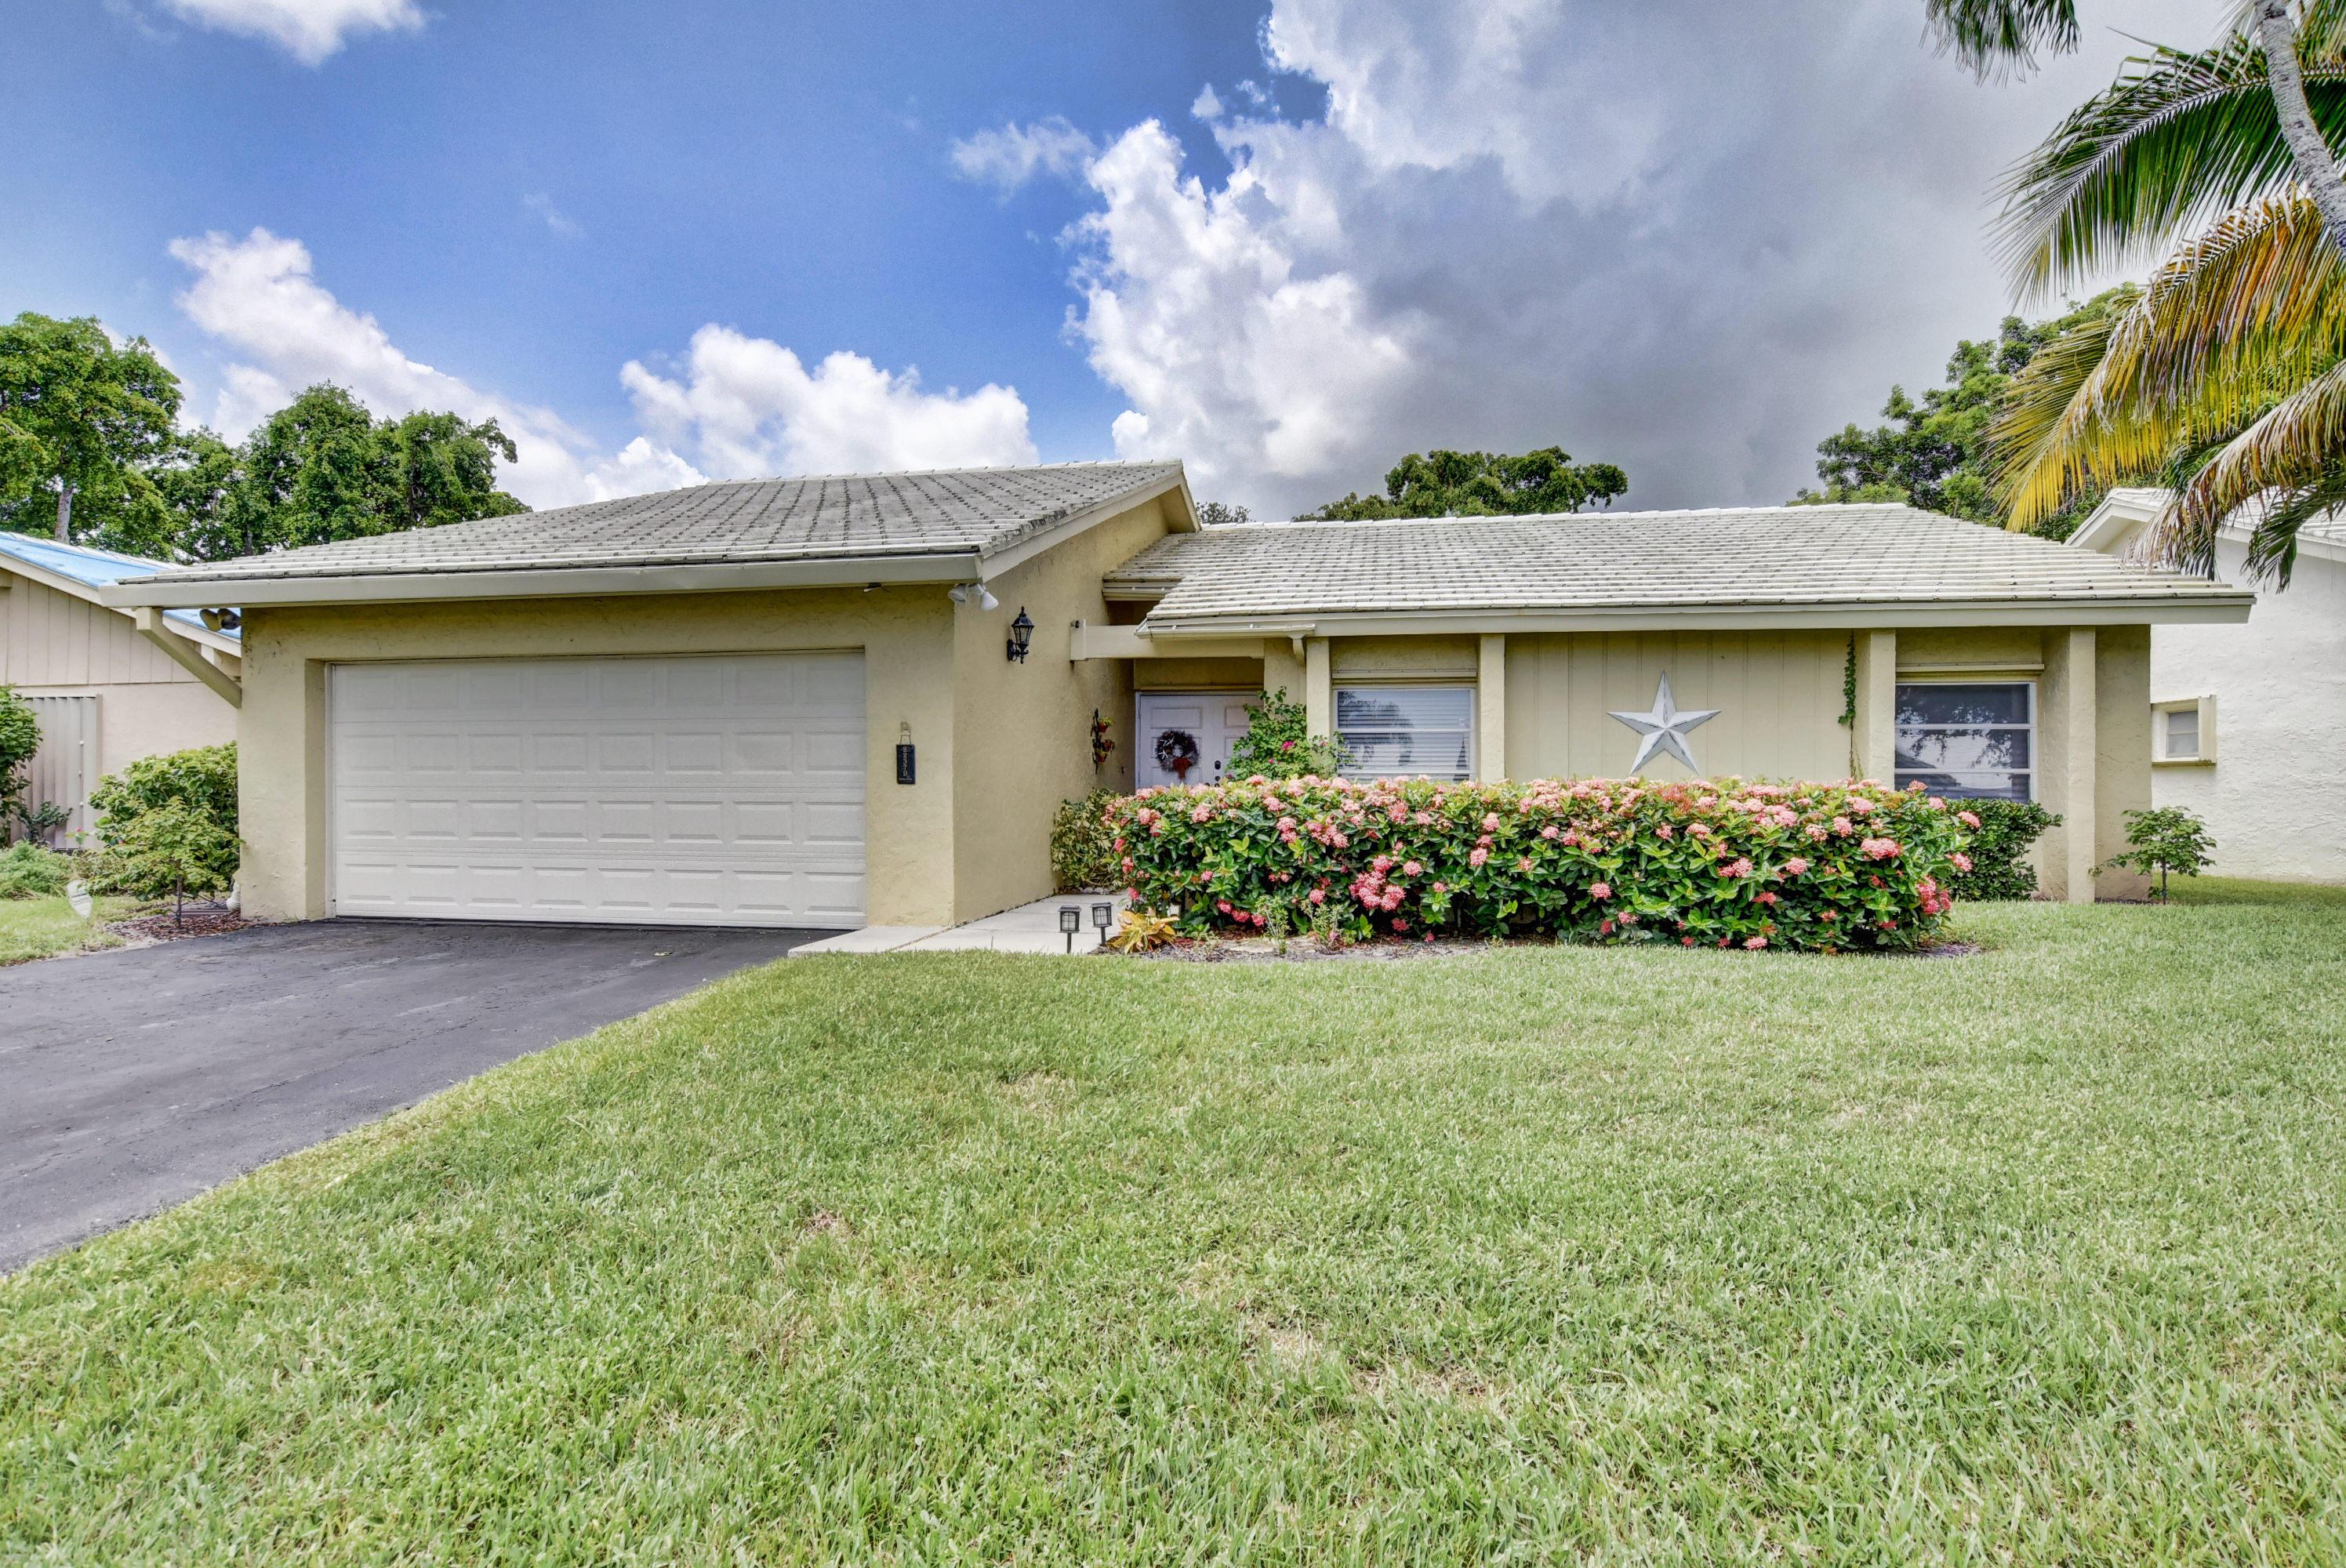 22379 Greentree Circle Boca Raton, FL 33433